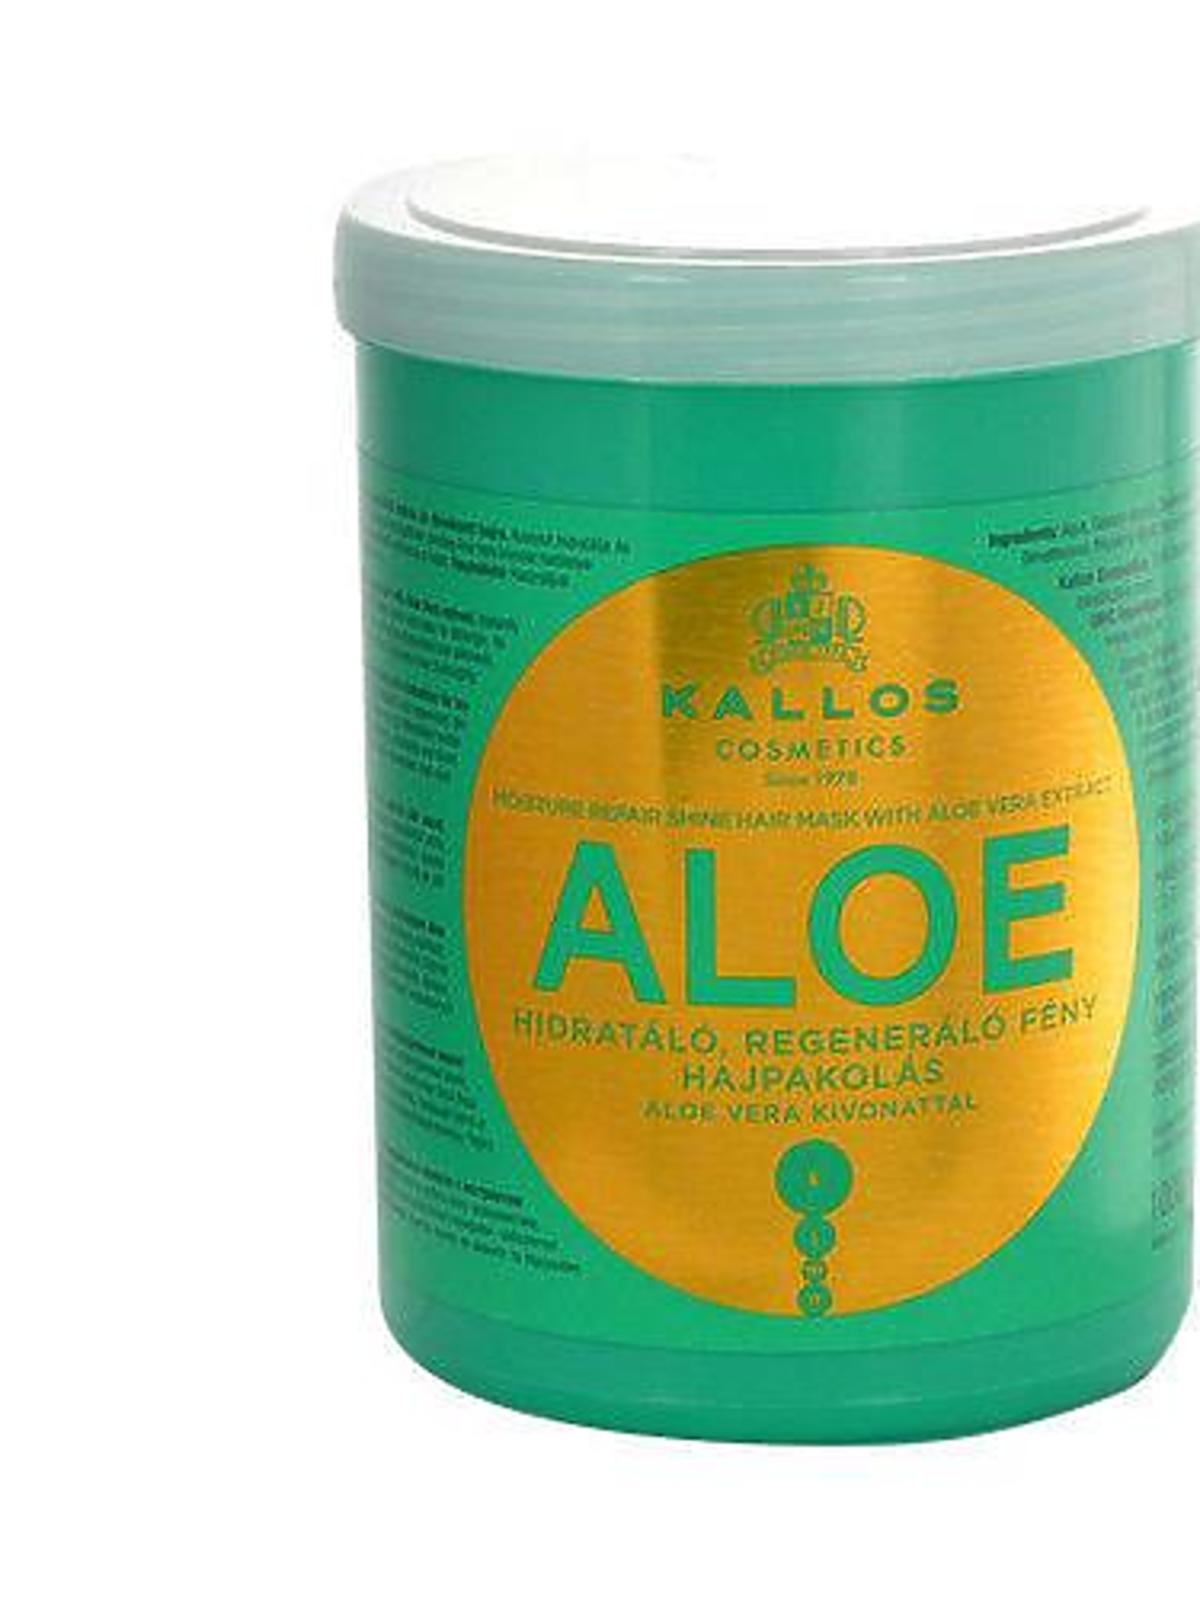 Kallos, Aloe, Aloesowa maska do włosów